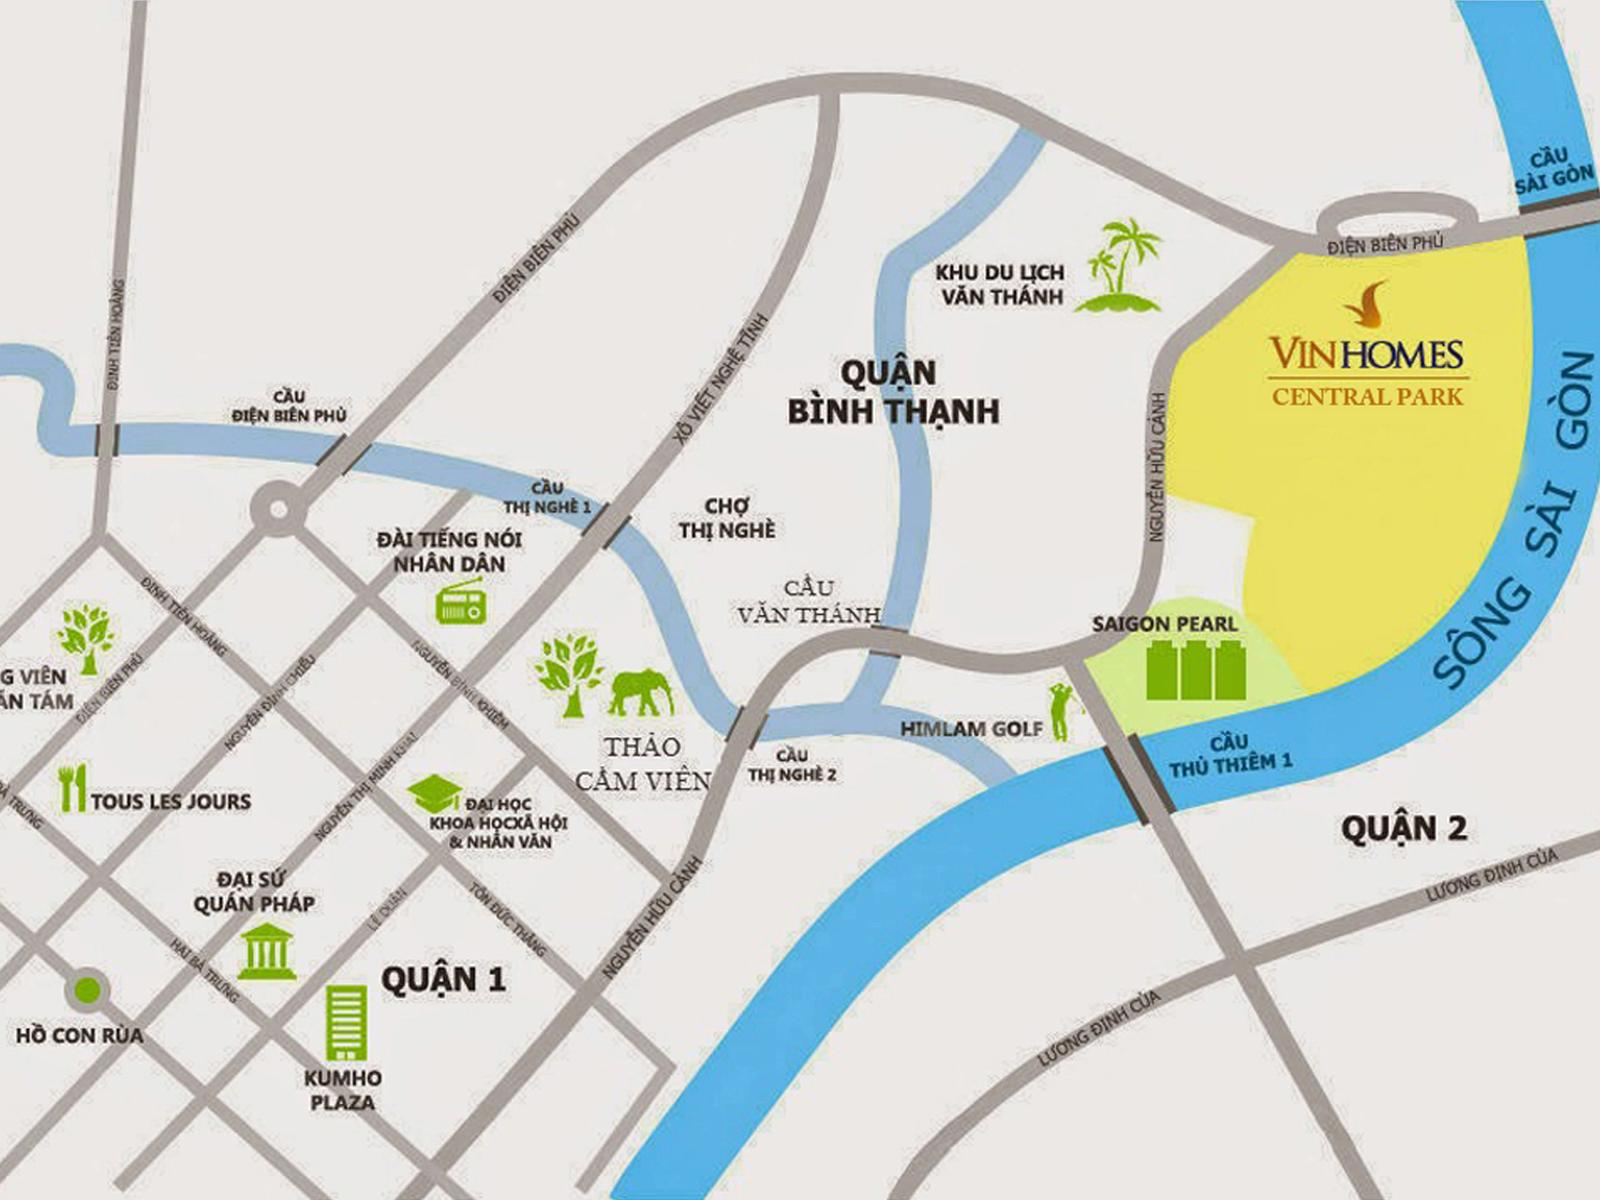 hinh anh Vi sao Vinhomes Central Park la du an duoc quan tam hang dau tai thanh pho Ho Chi Minh  so 4